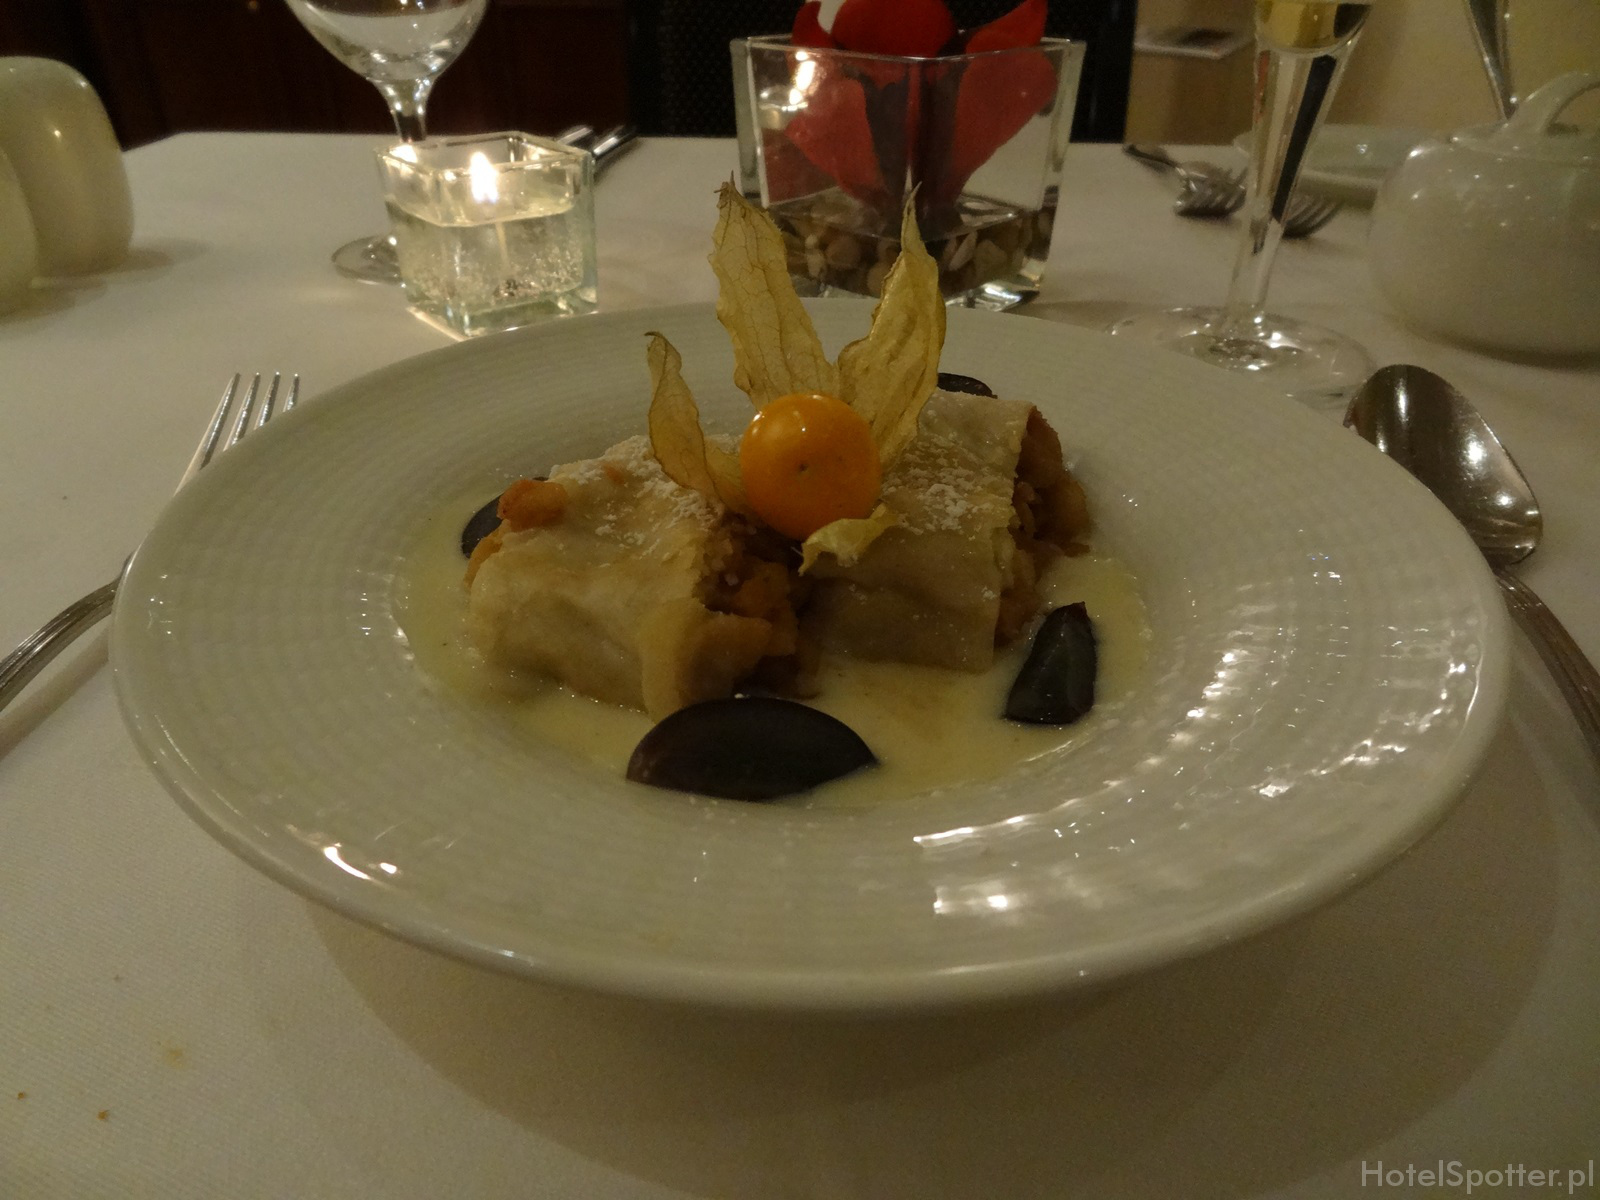 Maritim Hotel Berlin - club lounge apfelstrudel strudel jablkowy